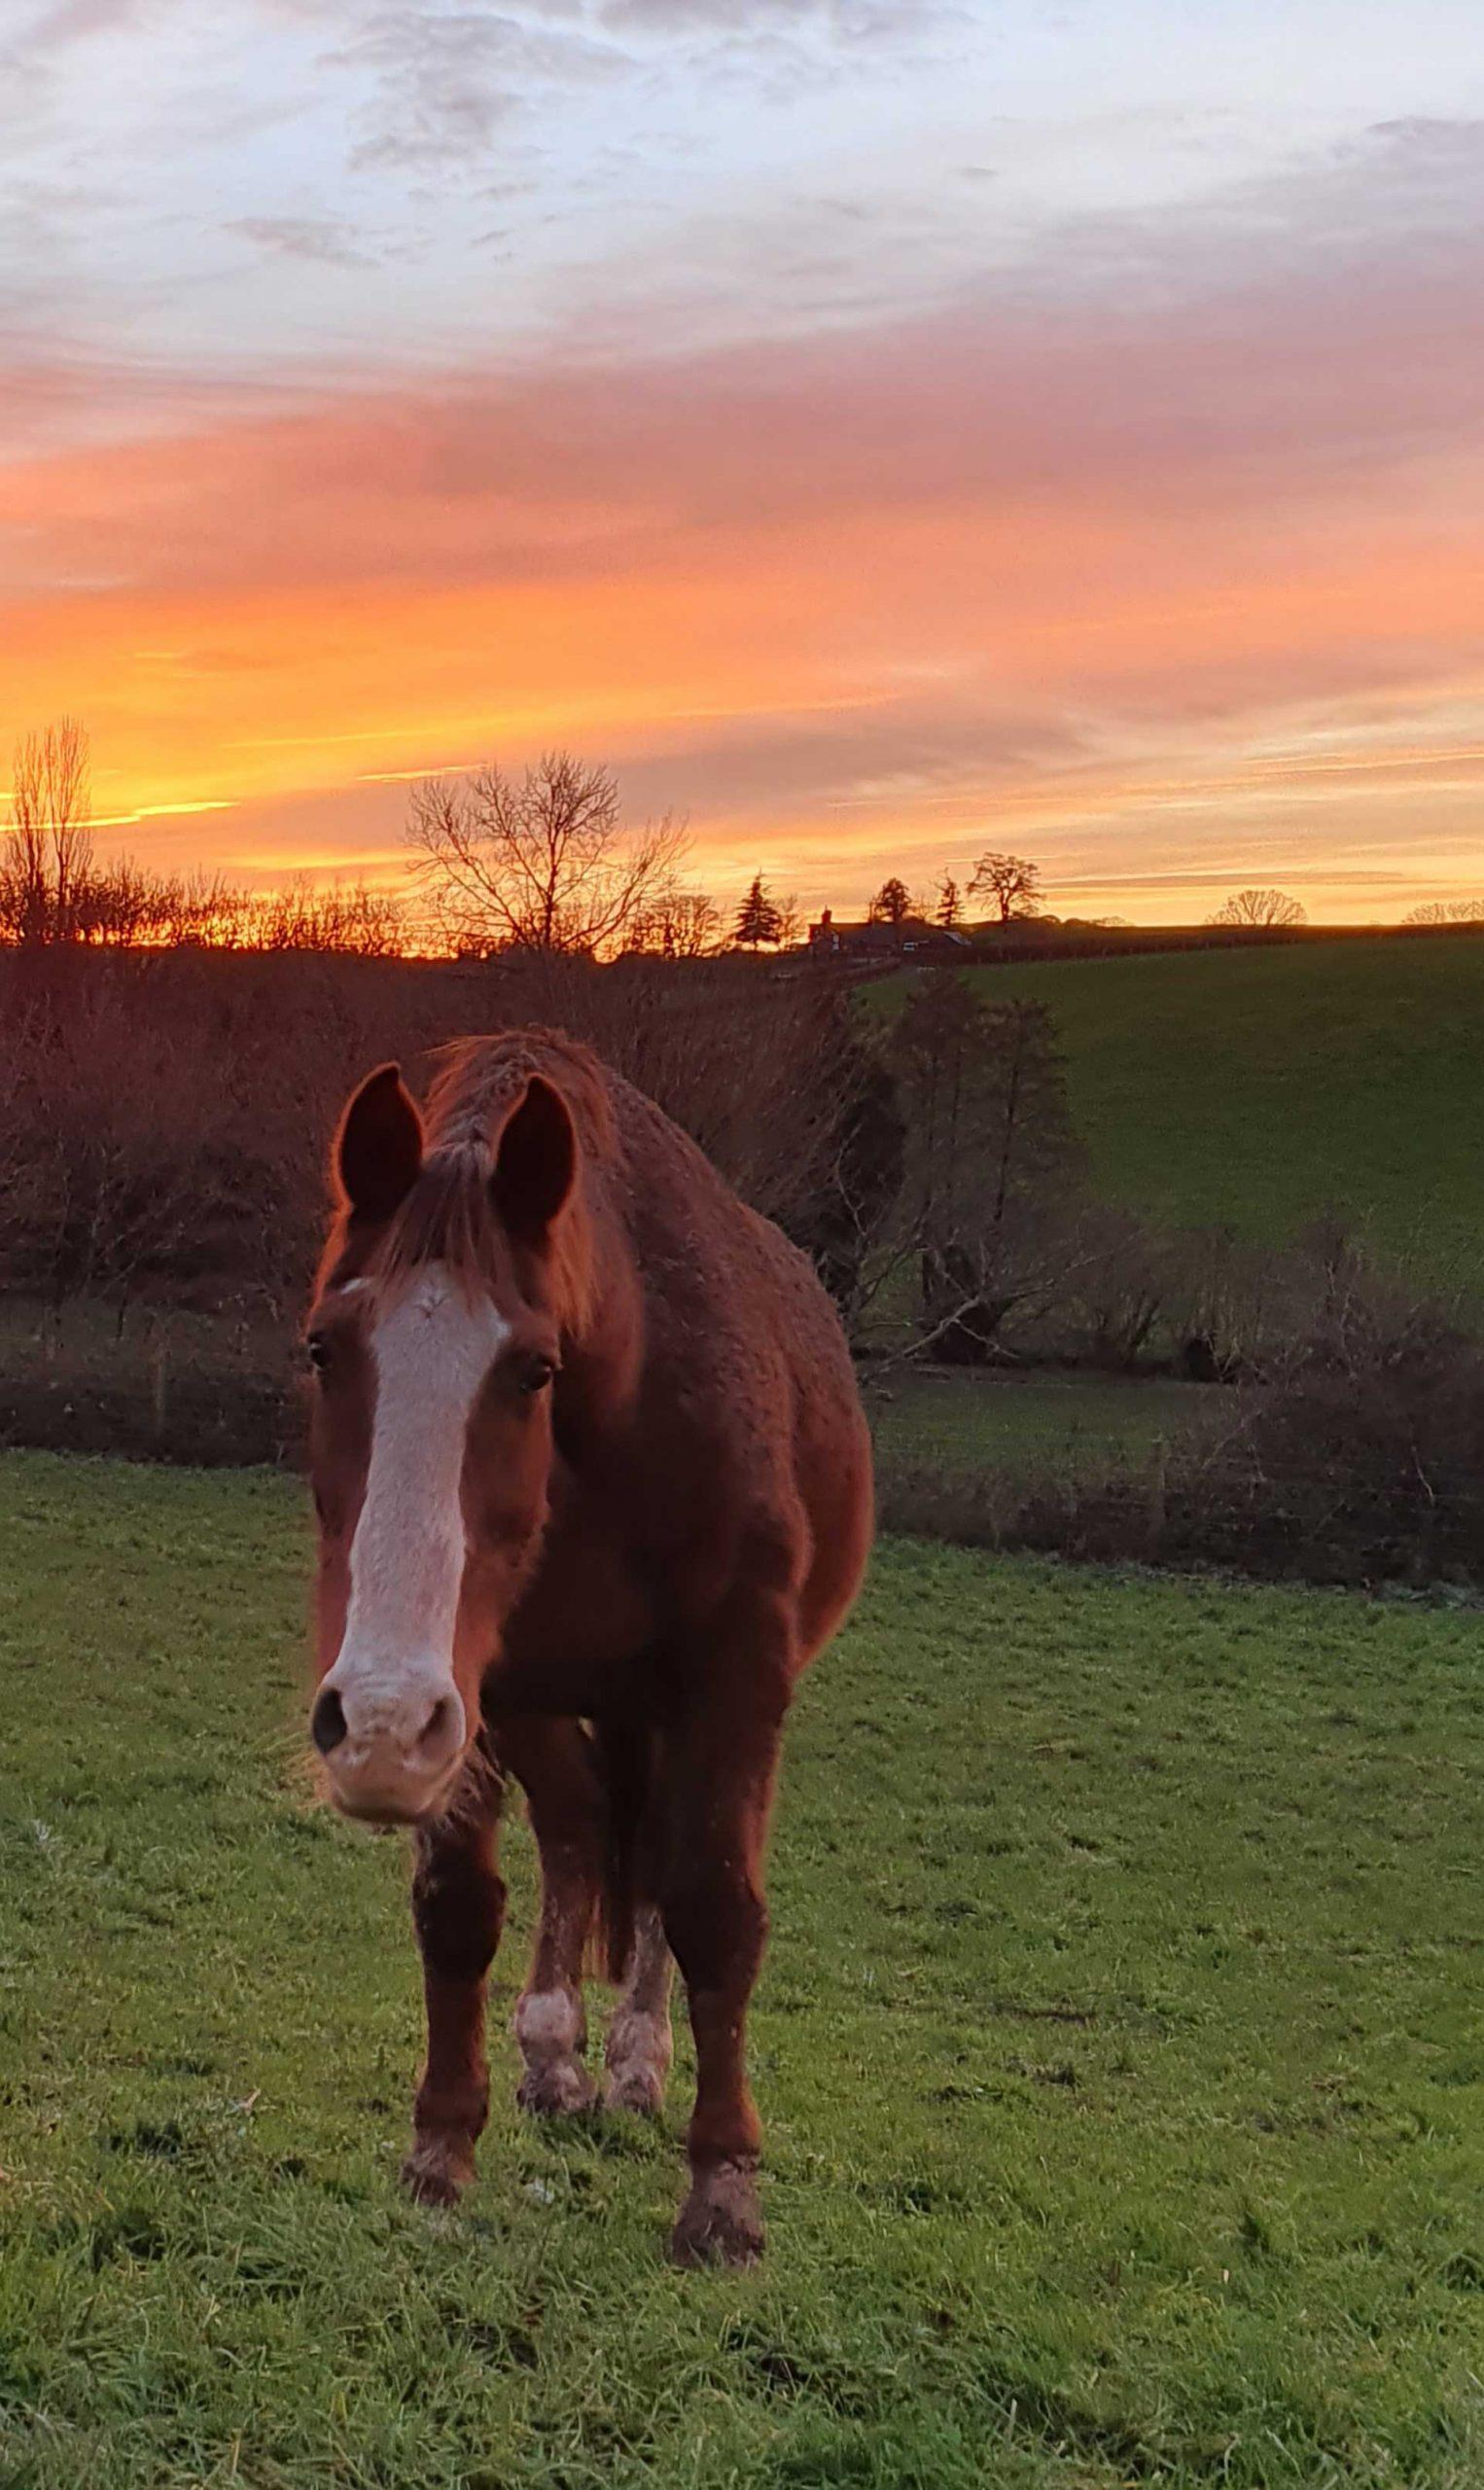 Chestnut horse in front of orange skies